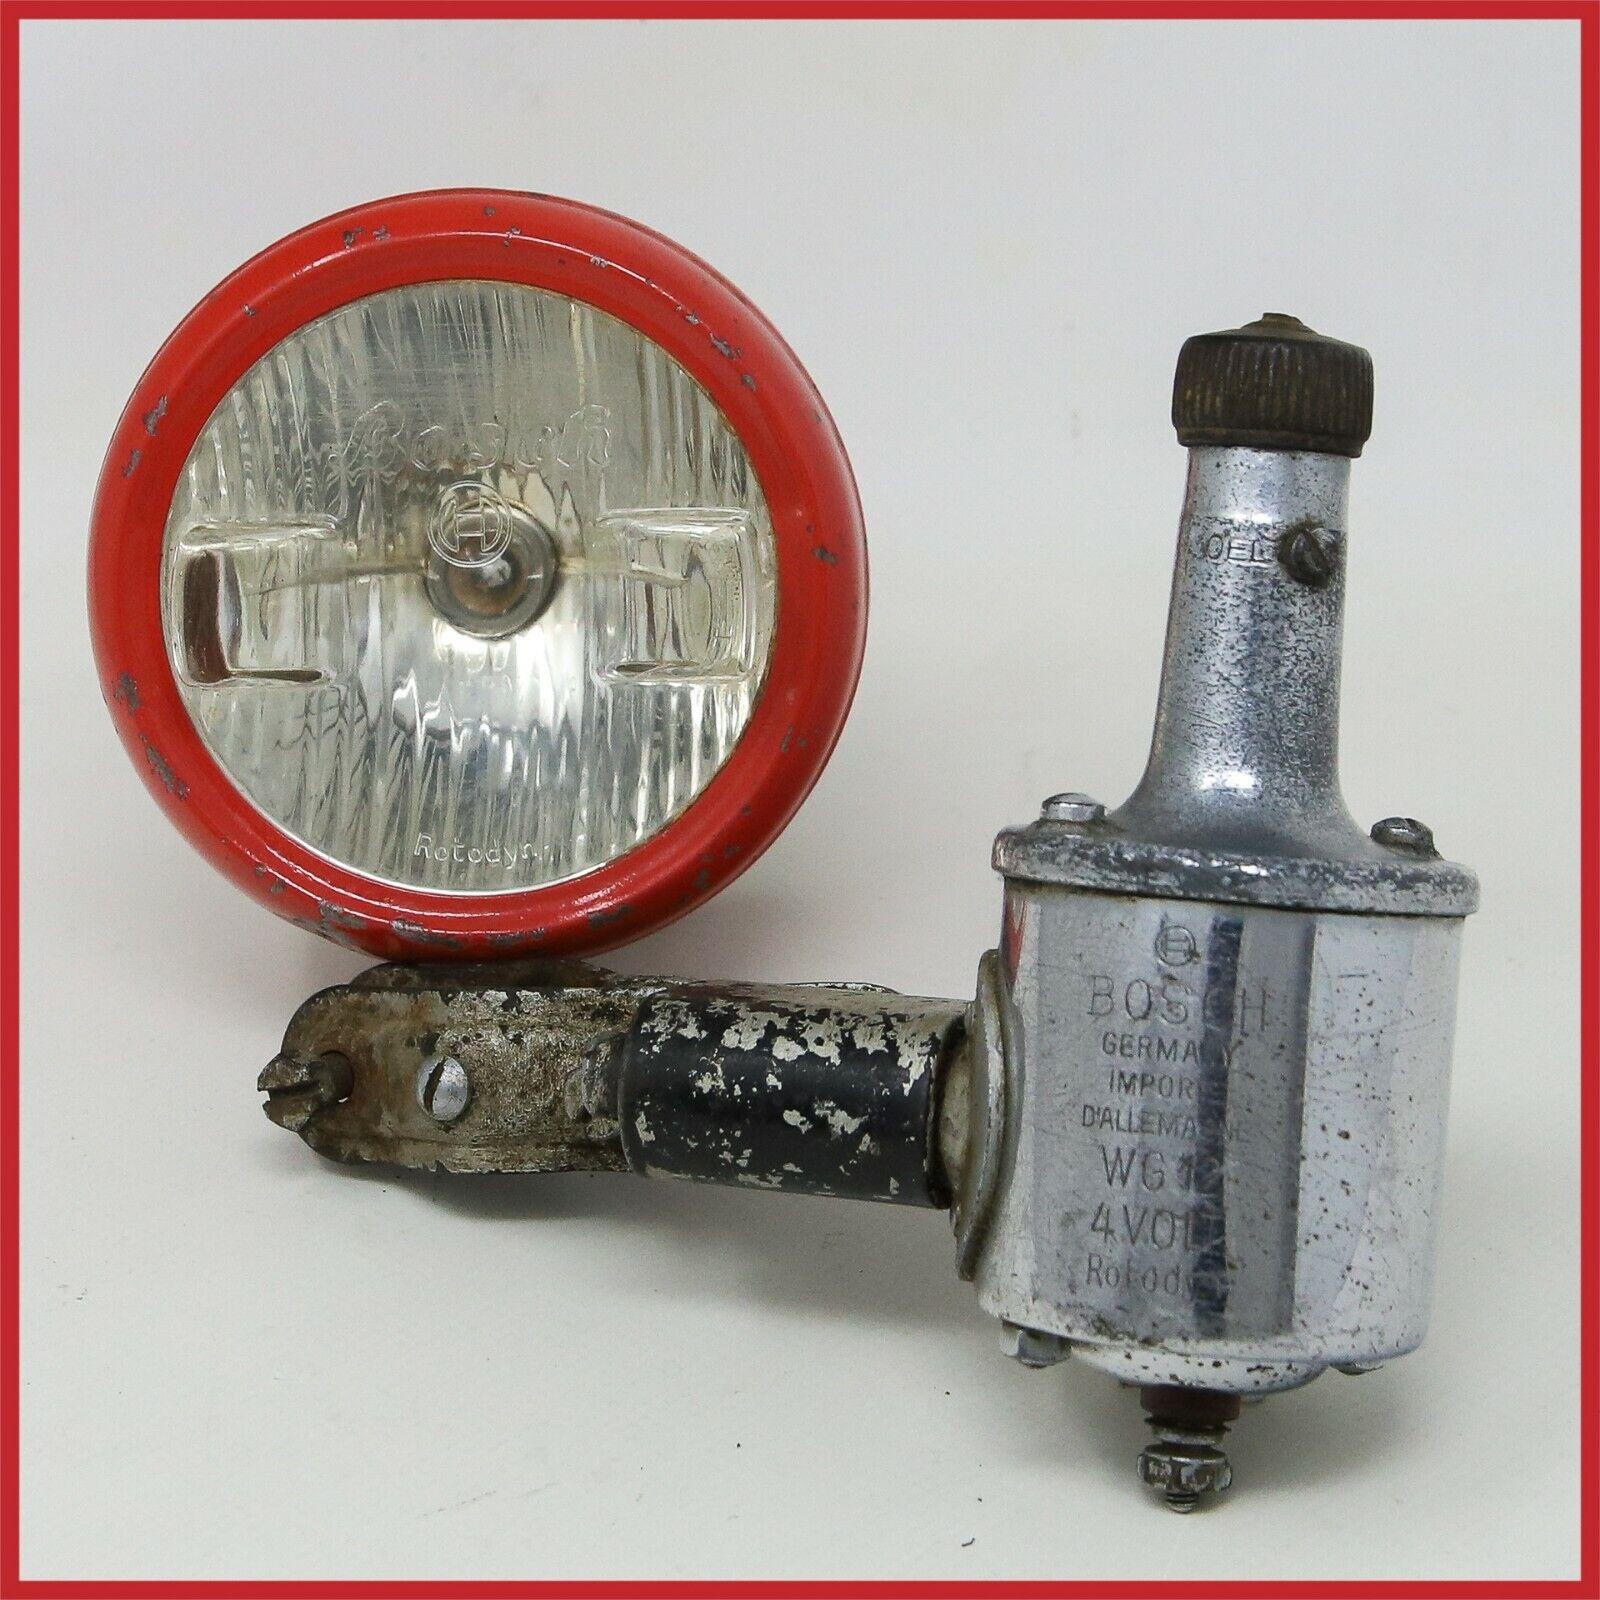 BOSH rossoODYN HEADLAMP DYNAMO 30s 40s strada TOURING BIKE ANTIQUE VINTAGE LAMP OLD